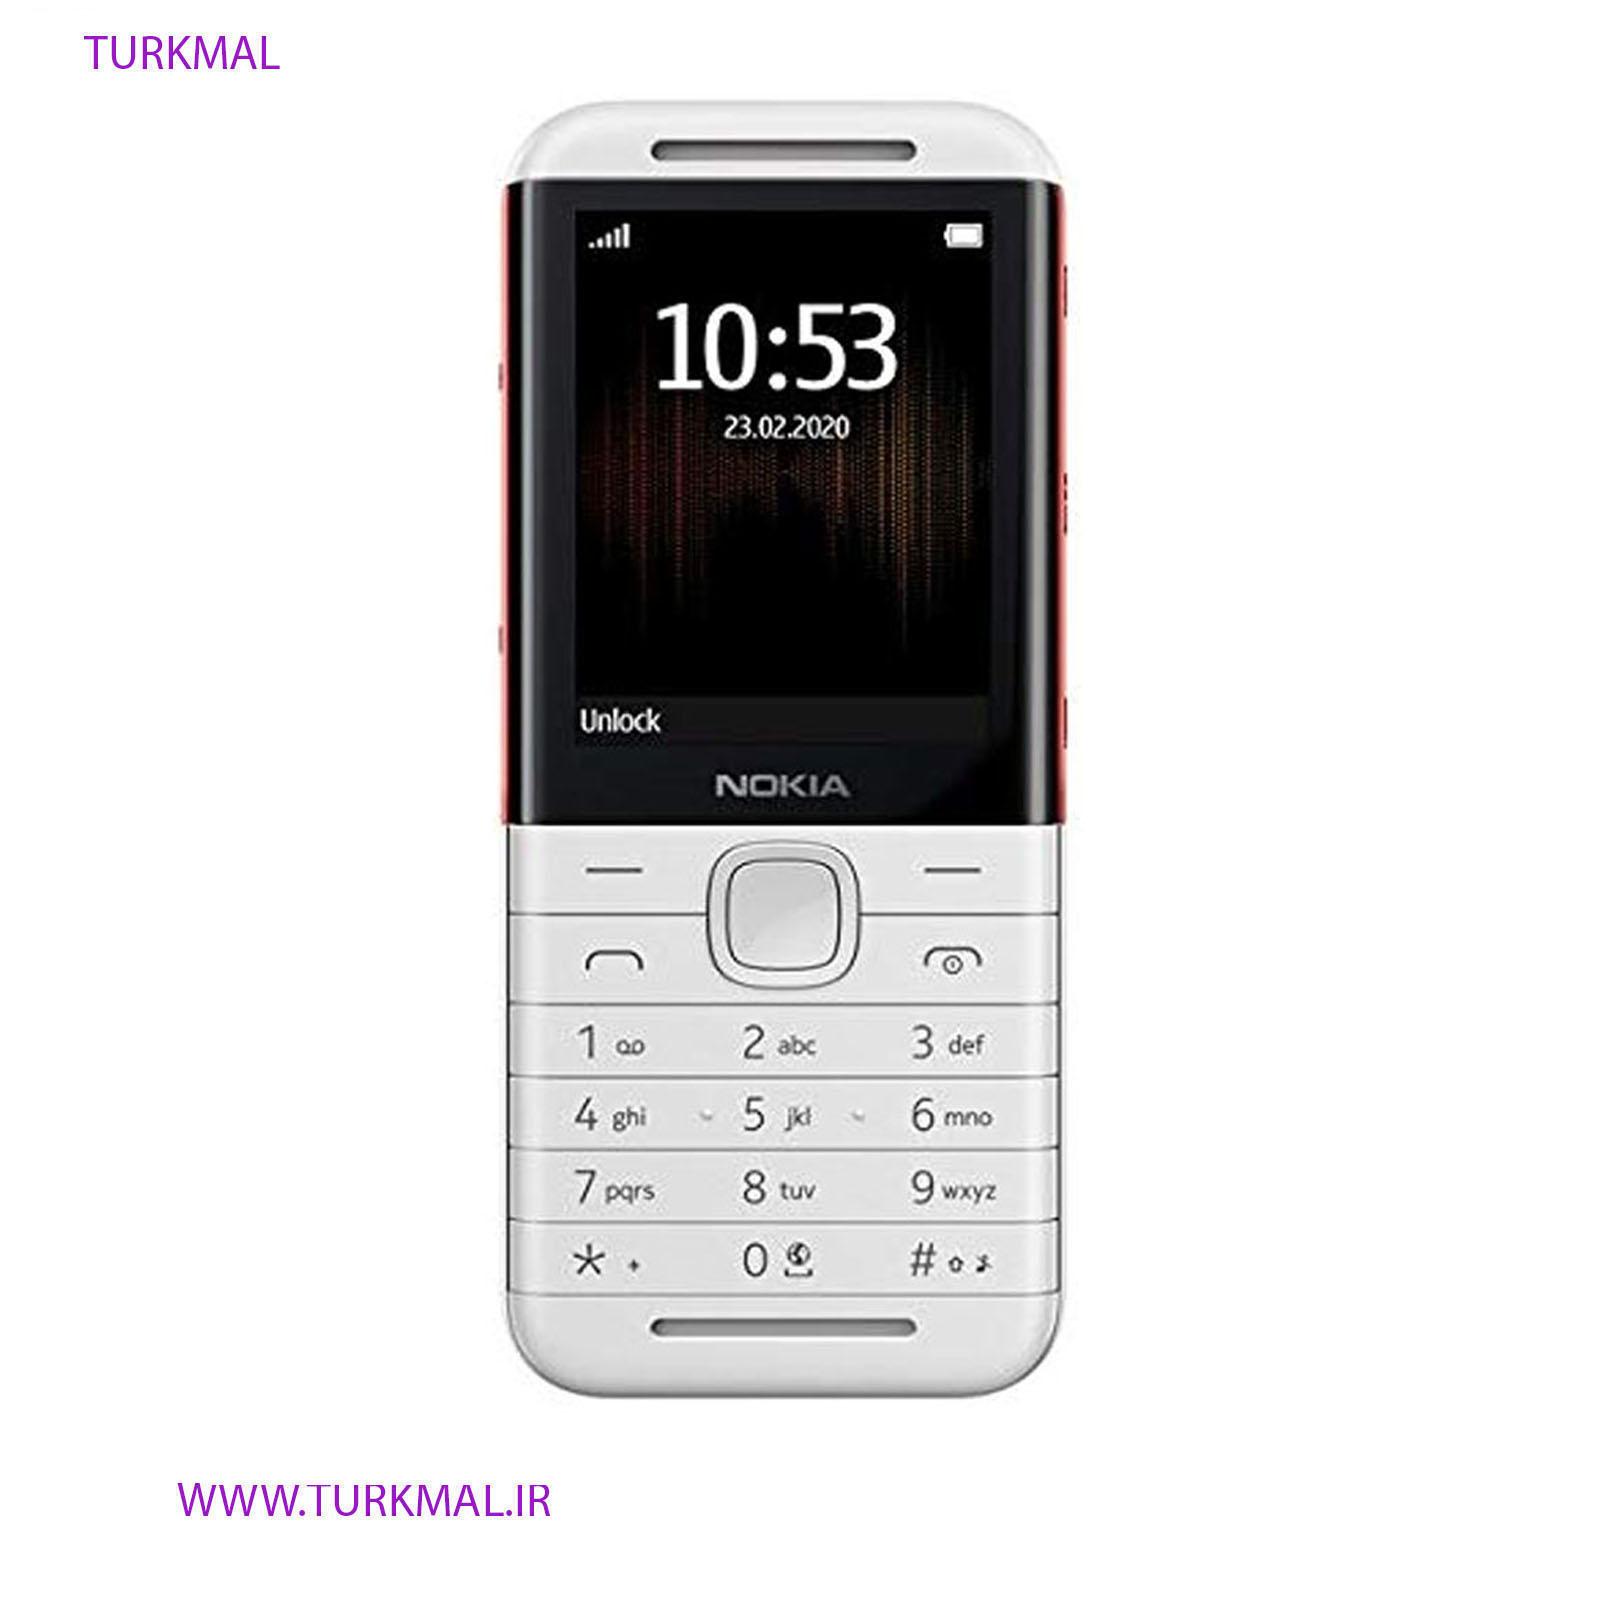 گوشی موبایل نوکیا مدل ۵۳۱۰ TA-1212 DS دو سیم کارت